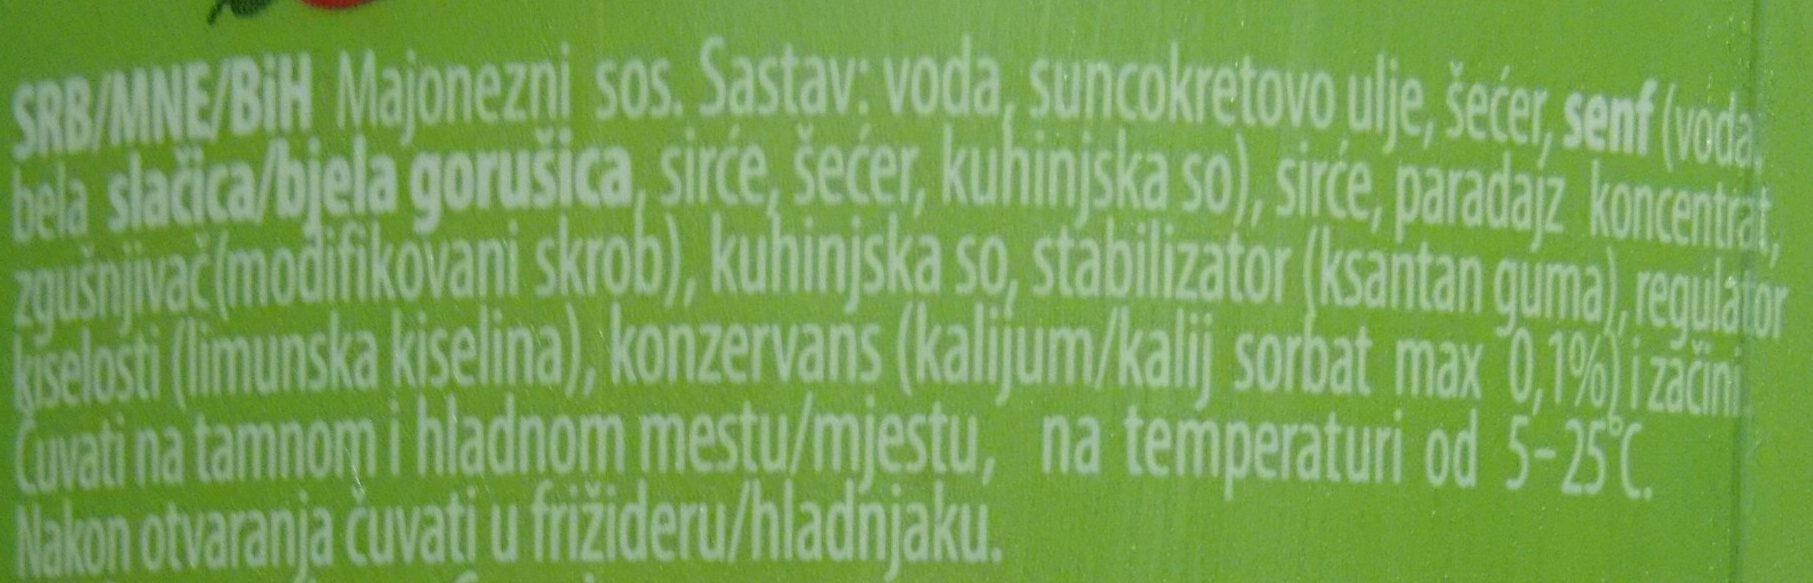 Gurman Delish Sendvič sos - Ingrédients - sr